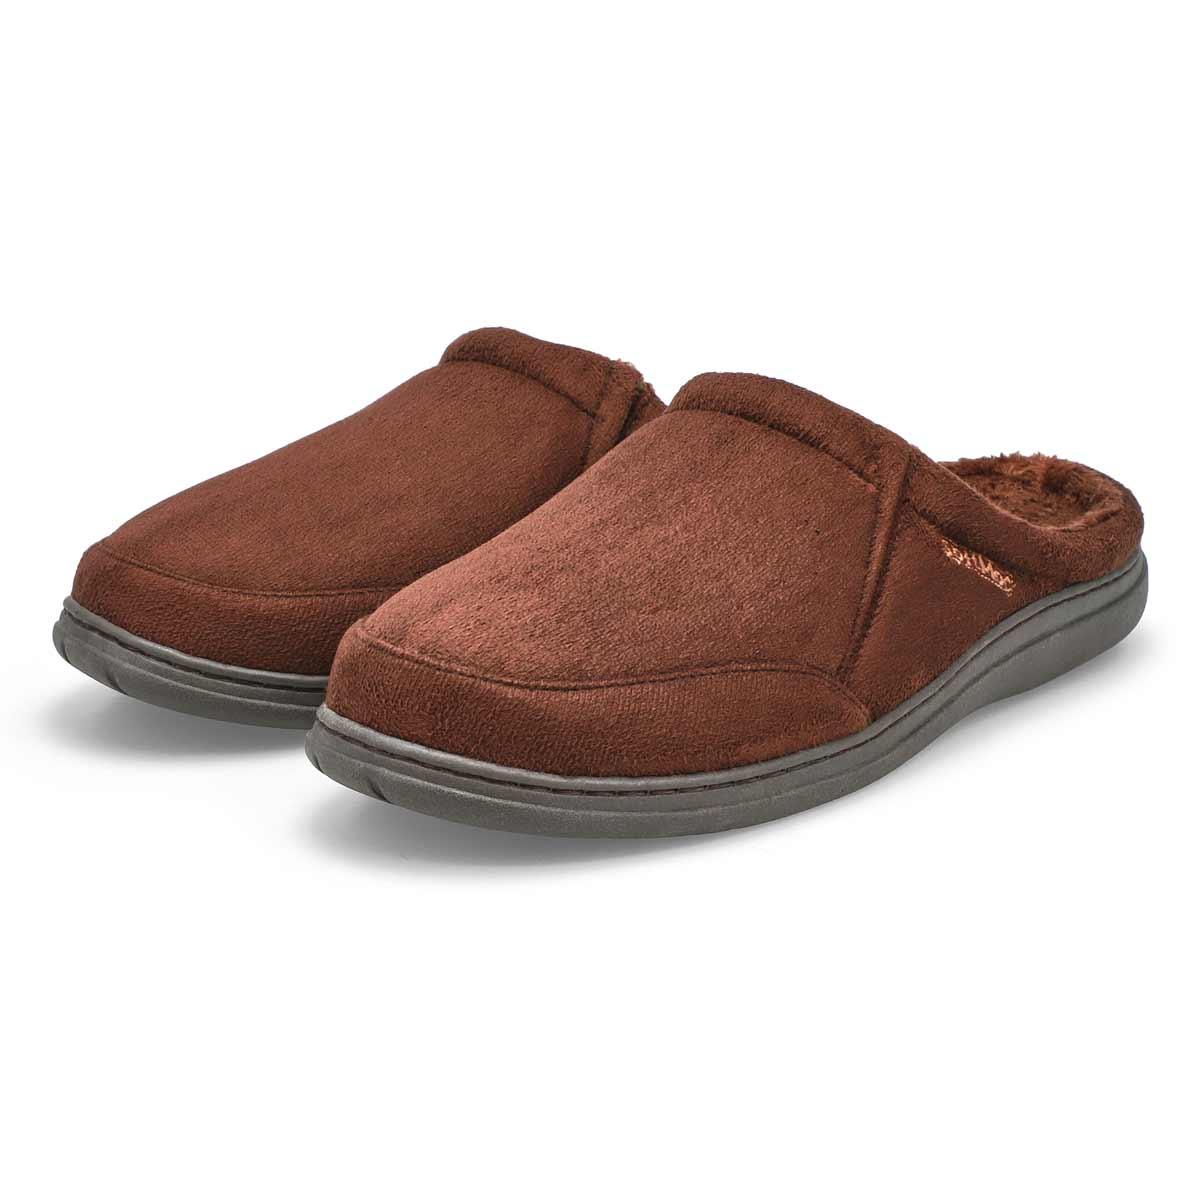 Mns Polar II brown open back slipper